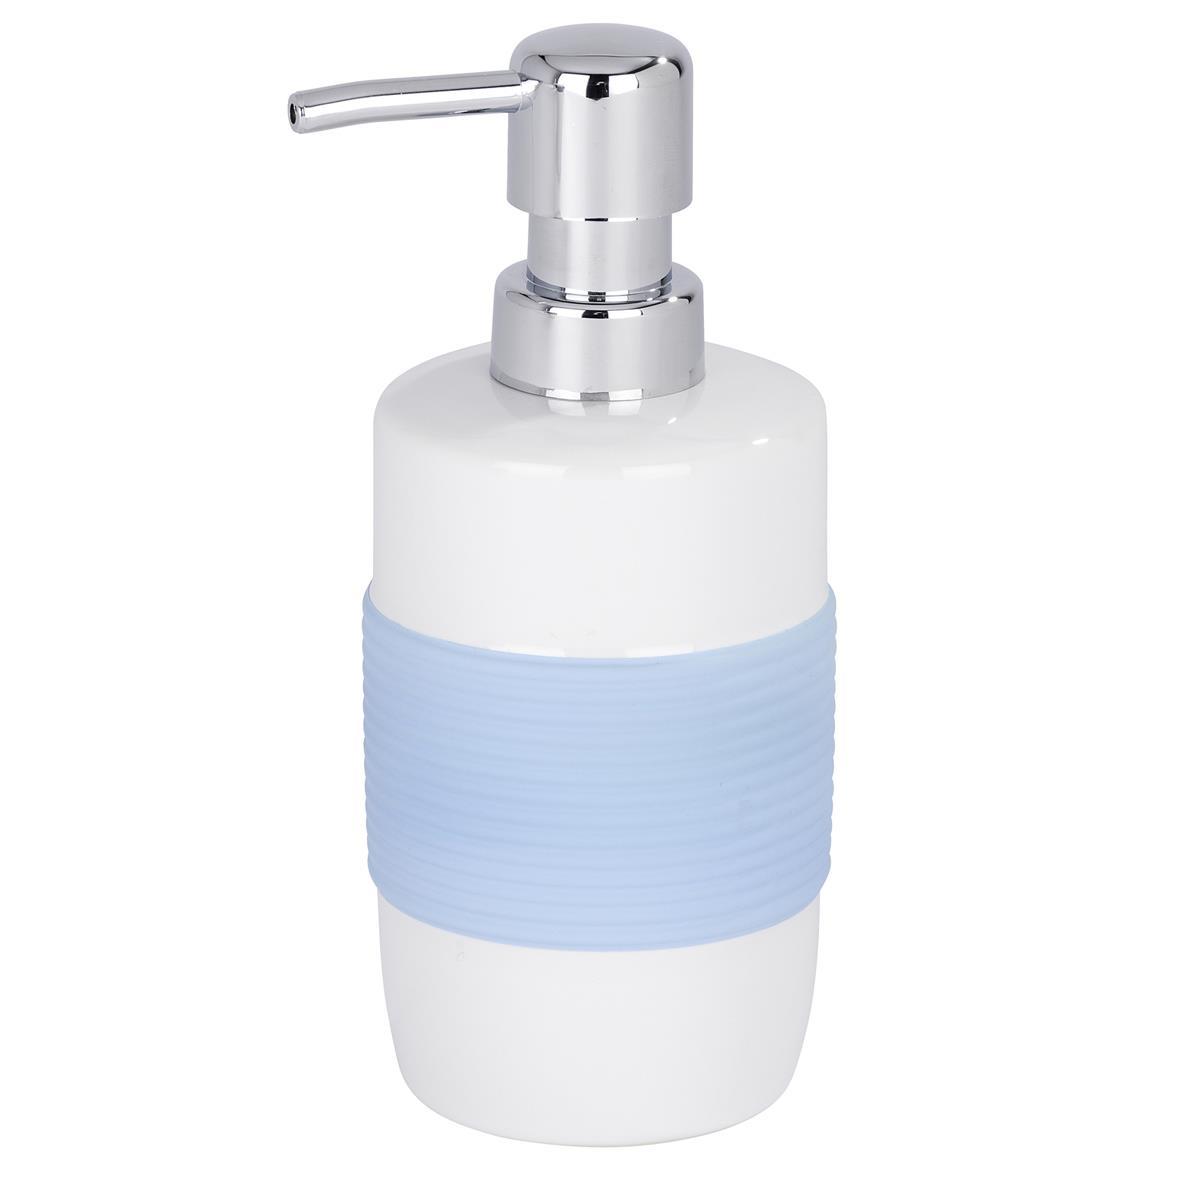 Wenko Seifenspender Bahia Keramik weiß blau Edelstahlpumpe nachfüllbar